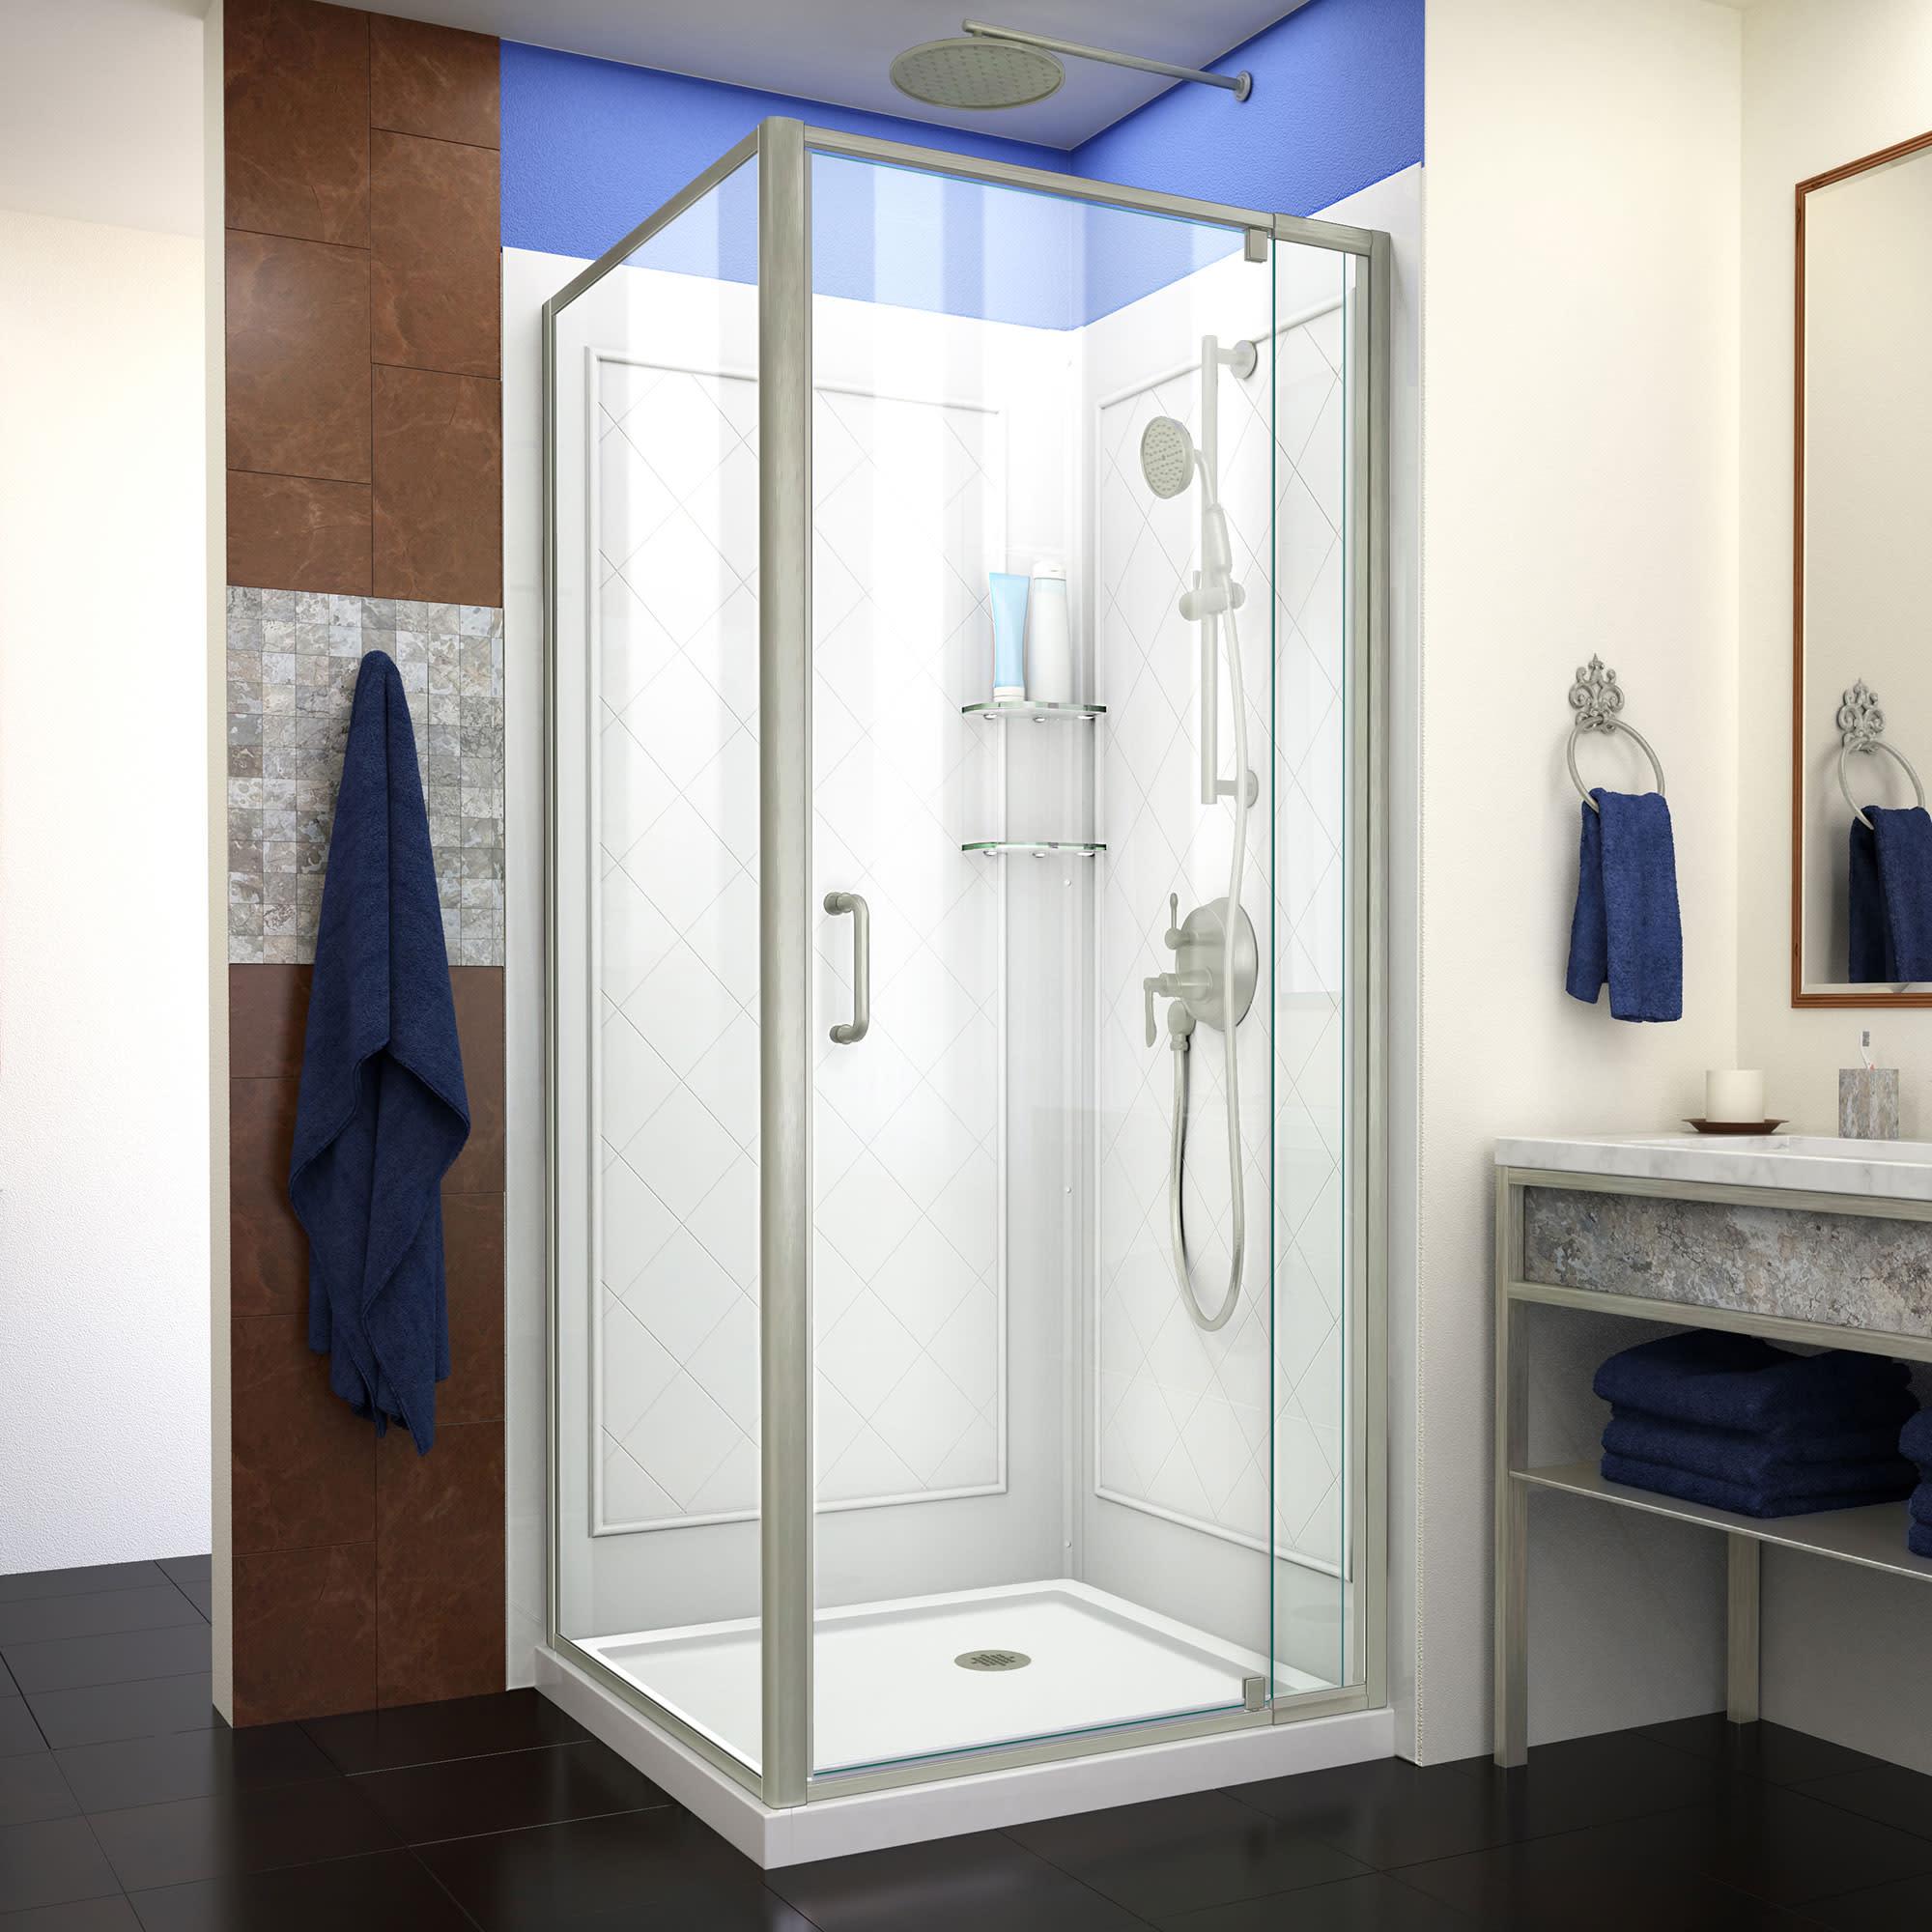 Dreamline Dl 6716 32 Flex Semi Frameless Shower Enclosure Corner Drain Base And Backwalls